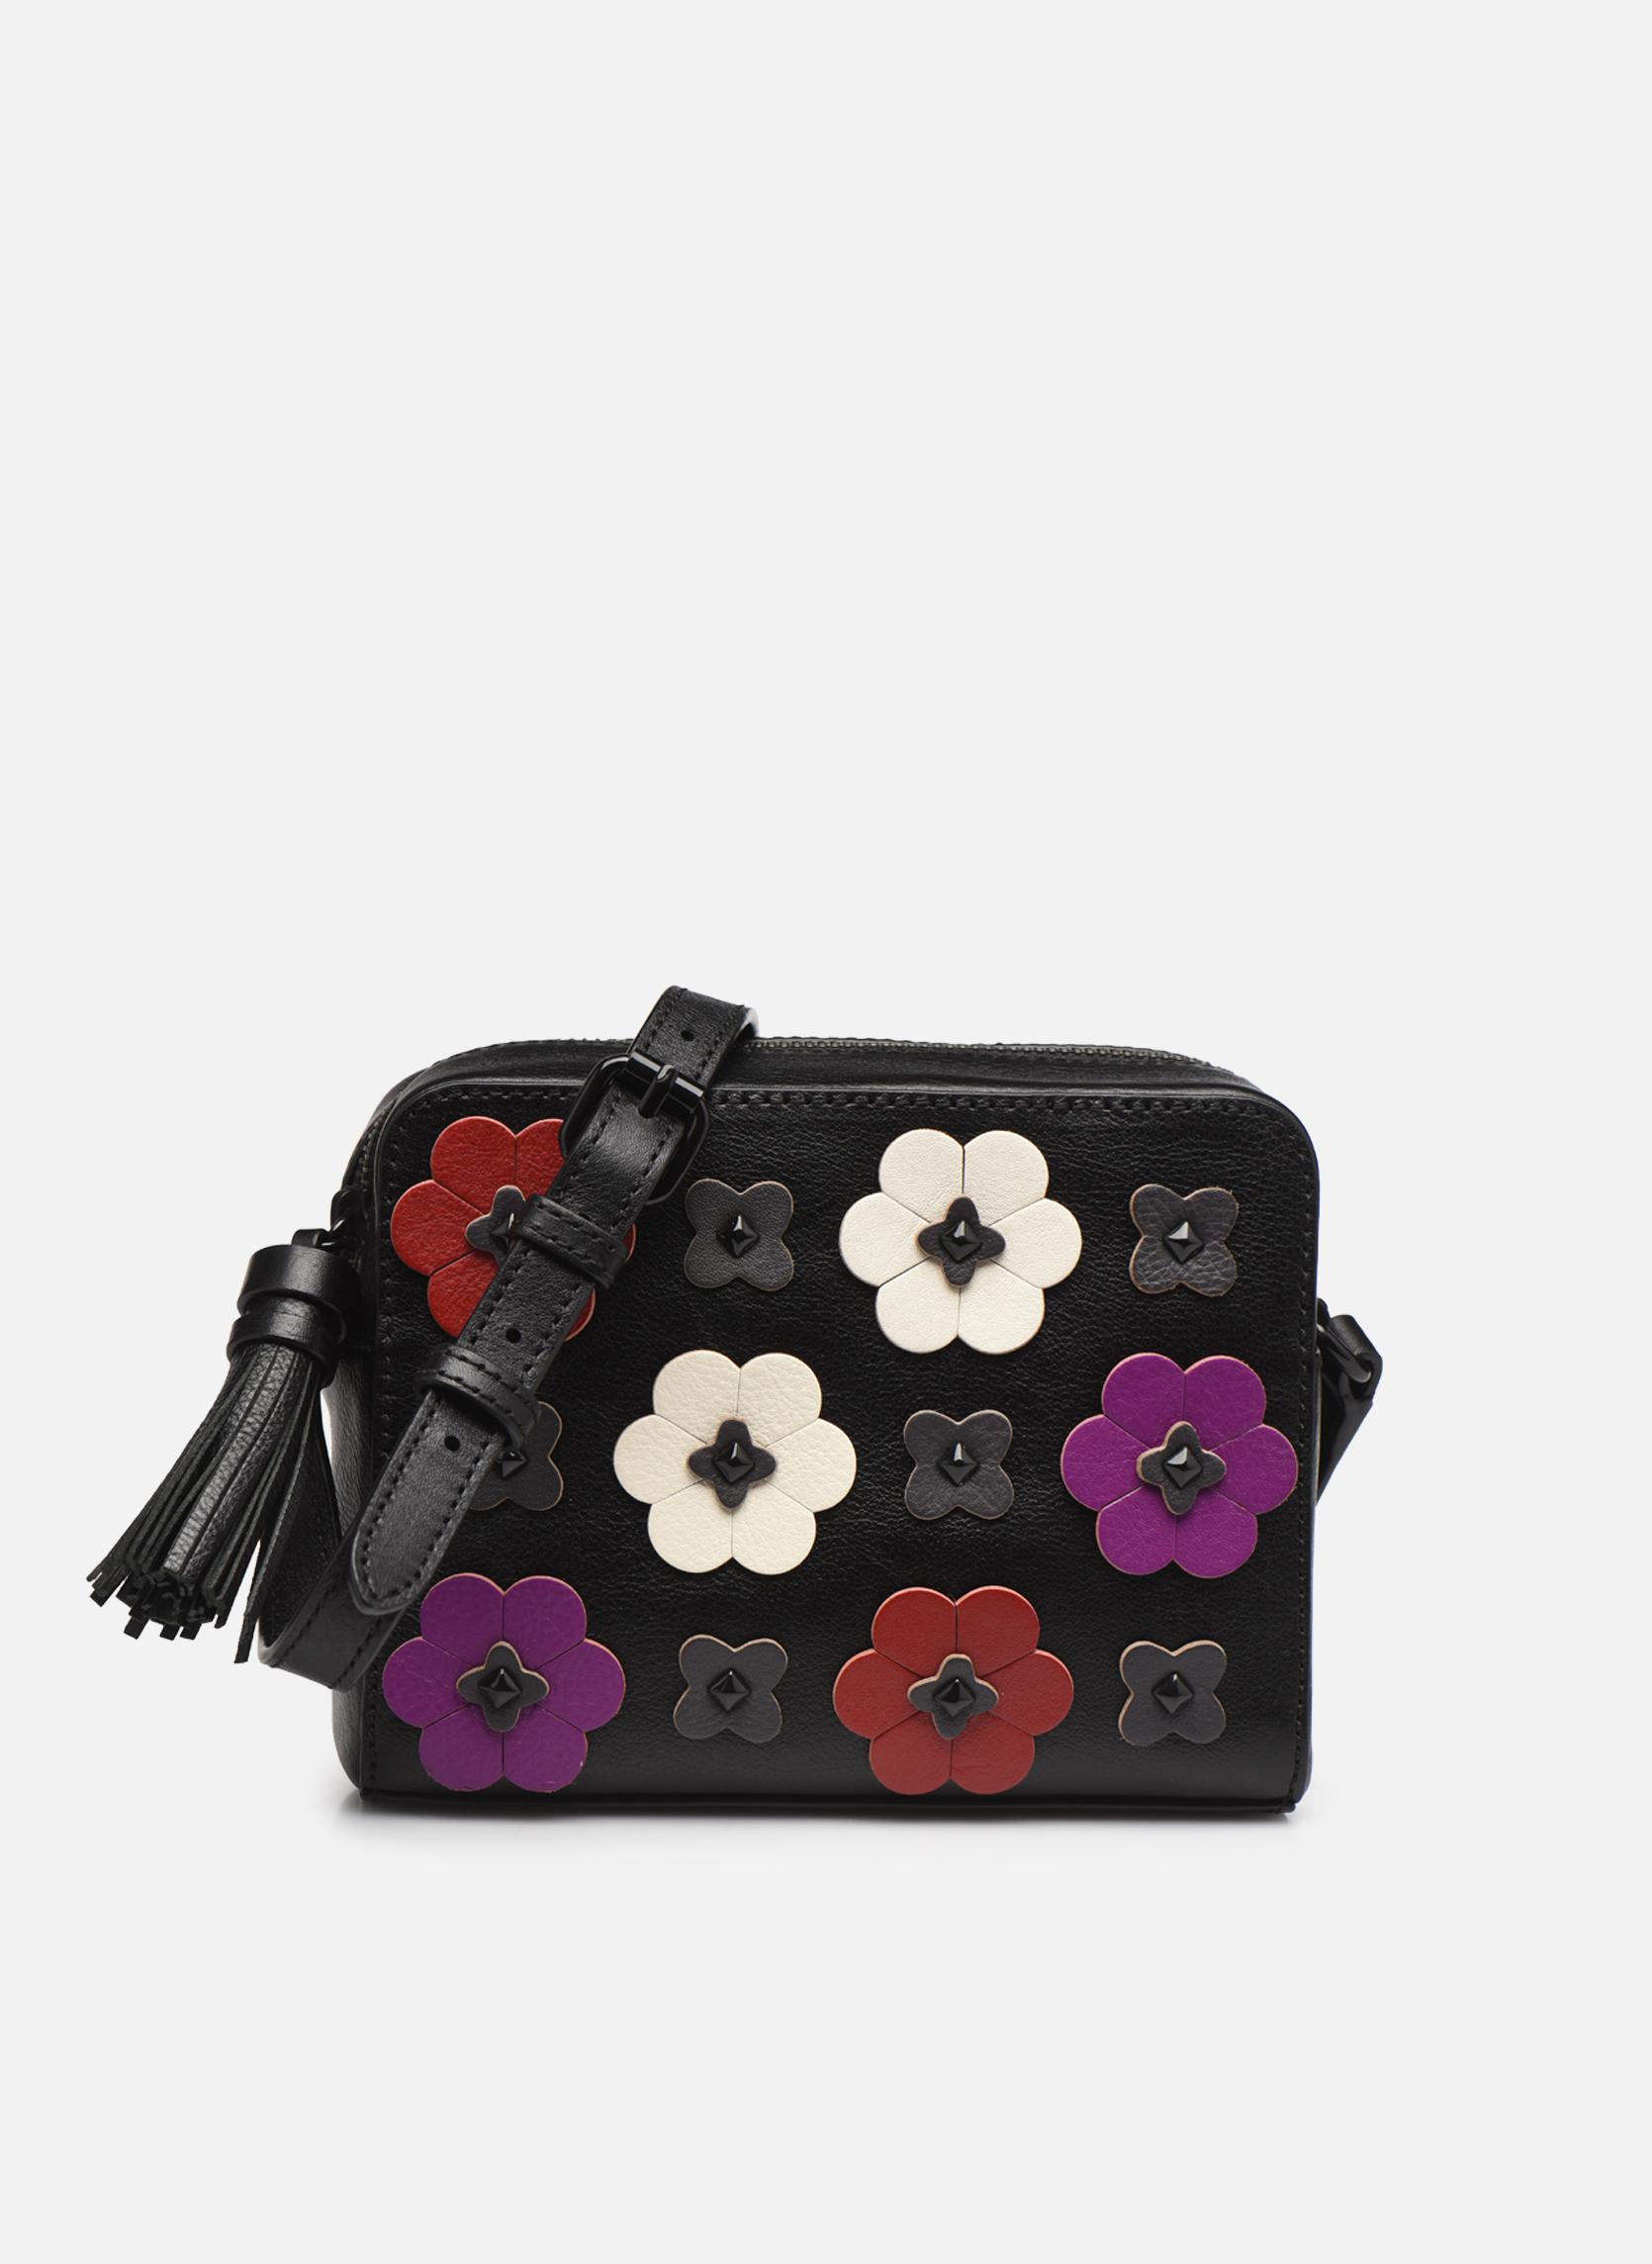 Floral Applique Camera bag Black multi